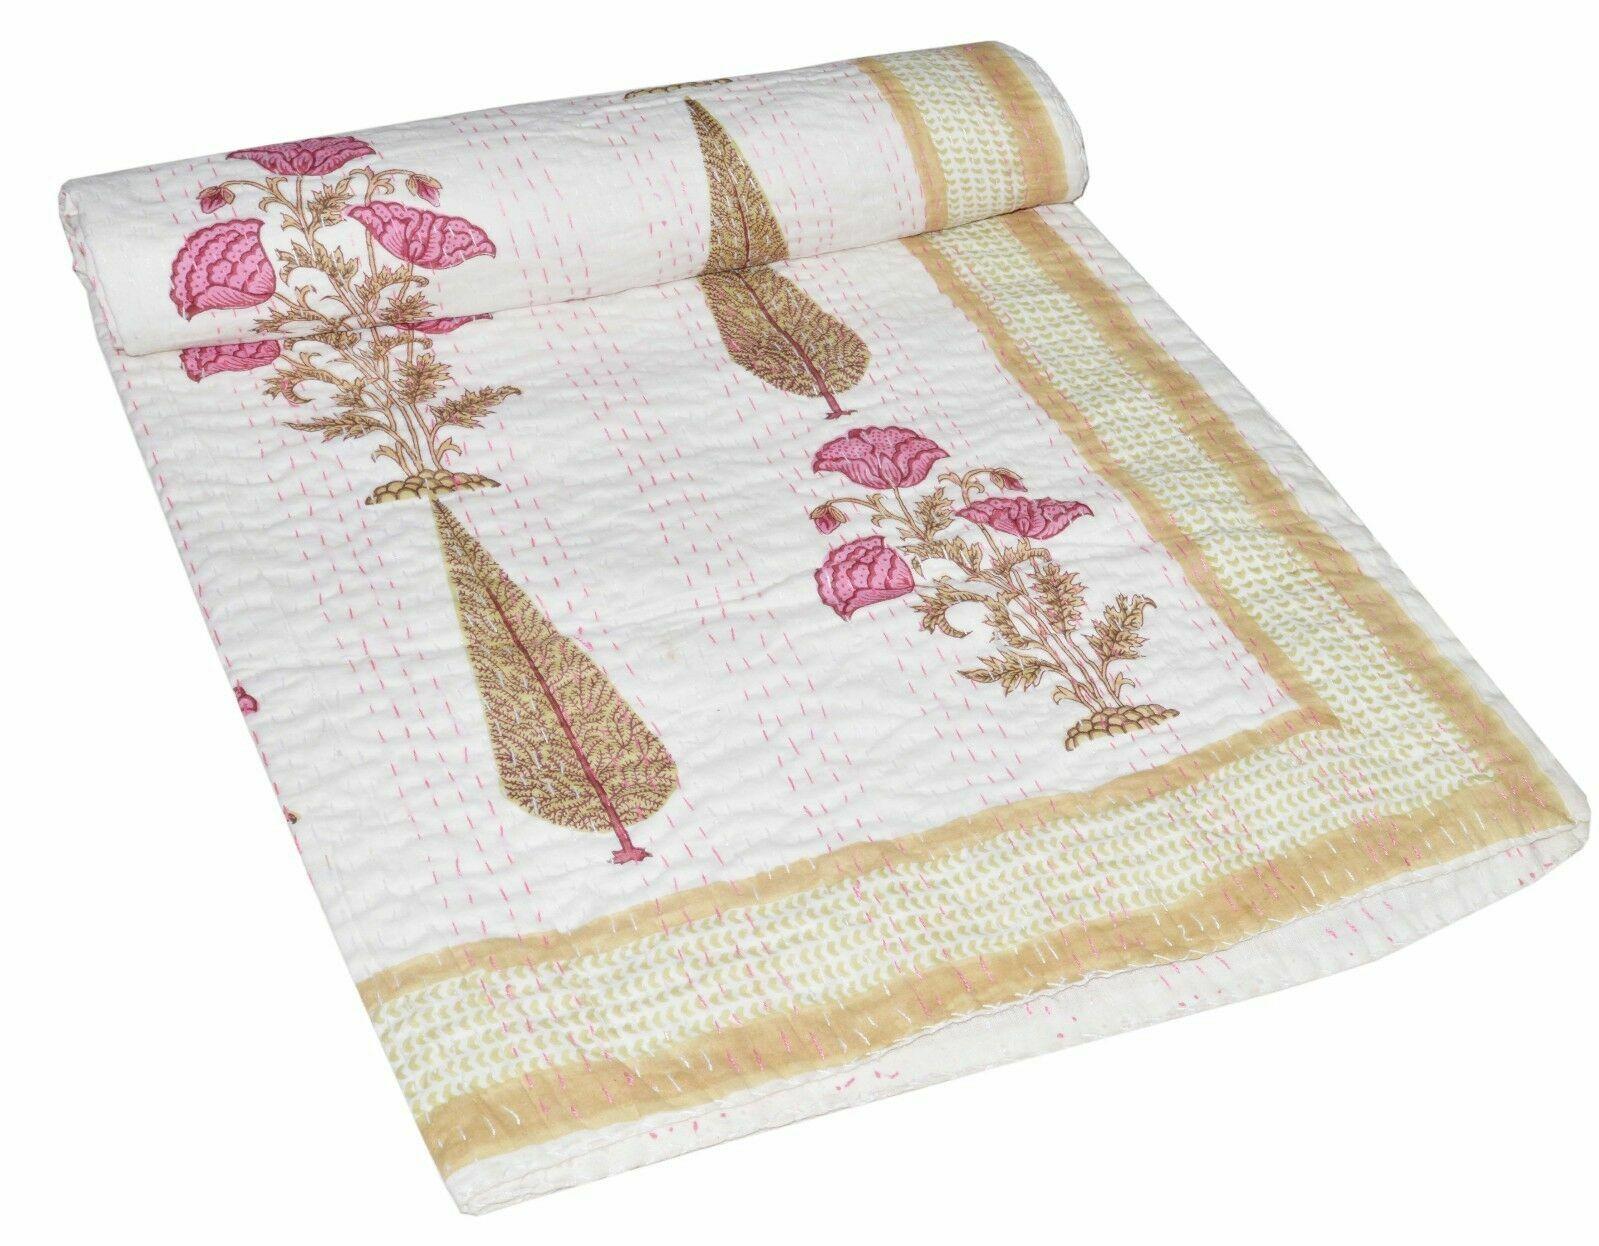 Indian Handmade Quilt Vintage Kantha Bedspread Throw Cotton Blanket Gudri Twin